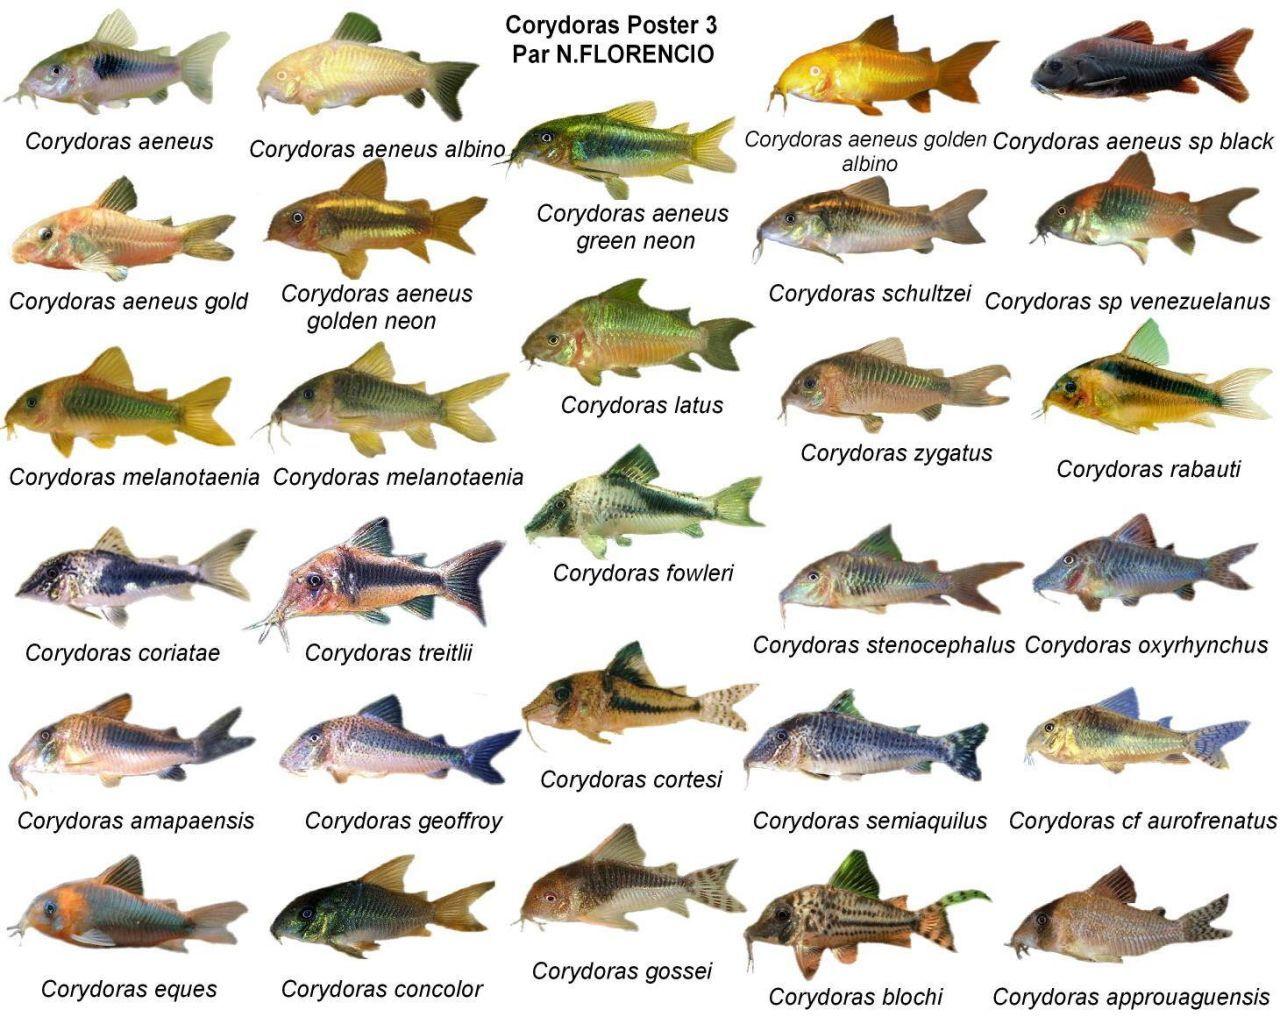 Freshwater aquarium fish poster - Poster